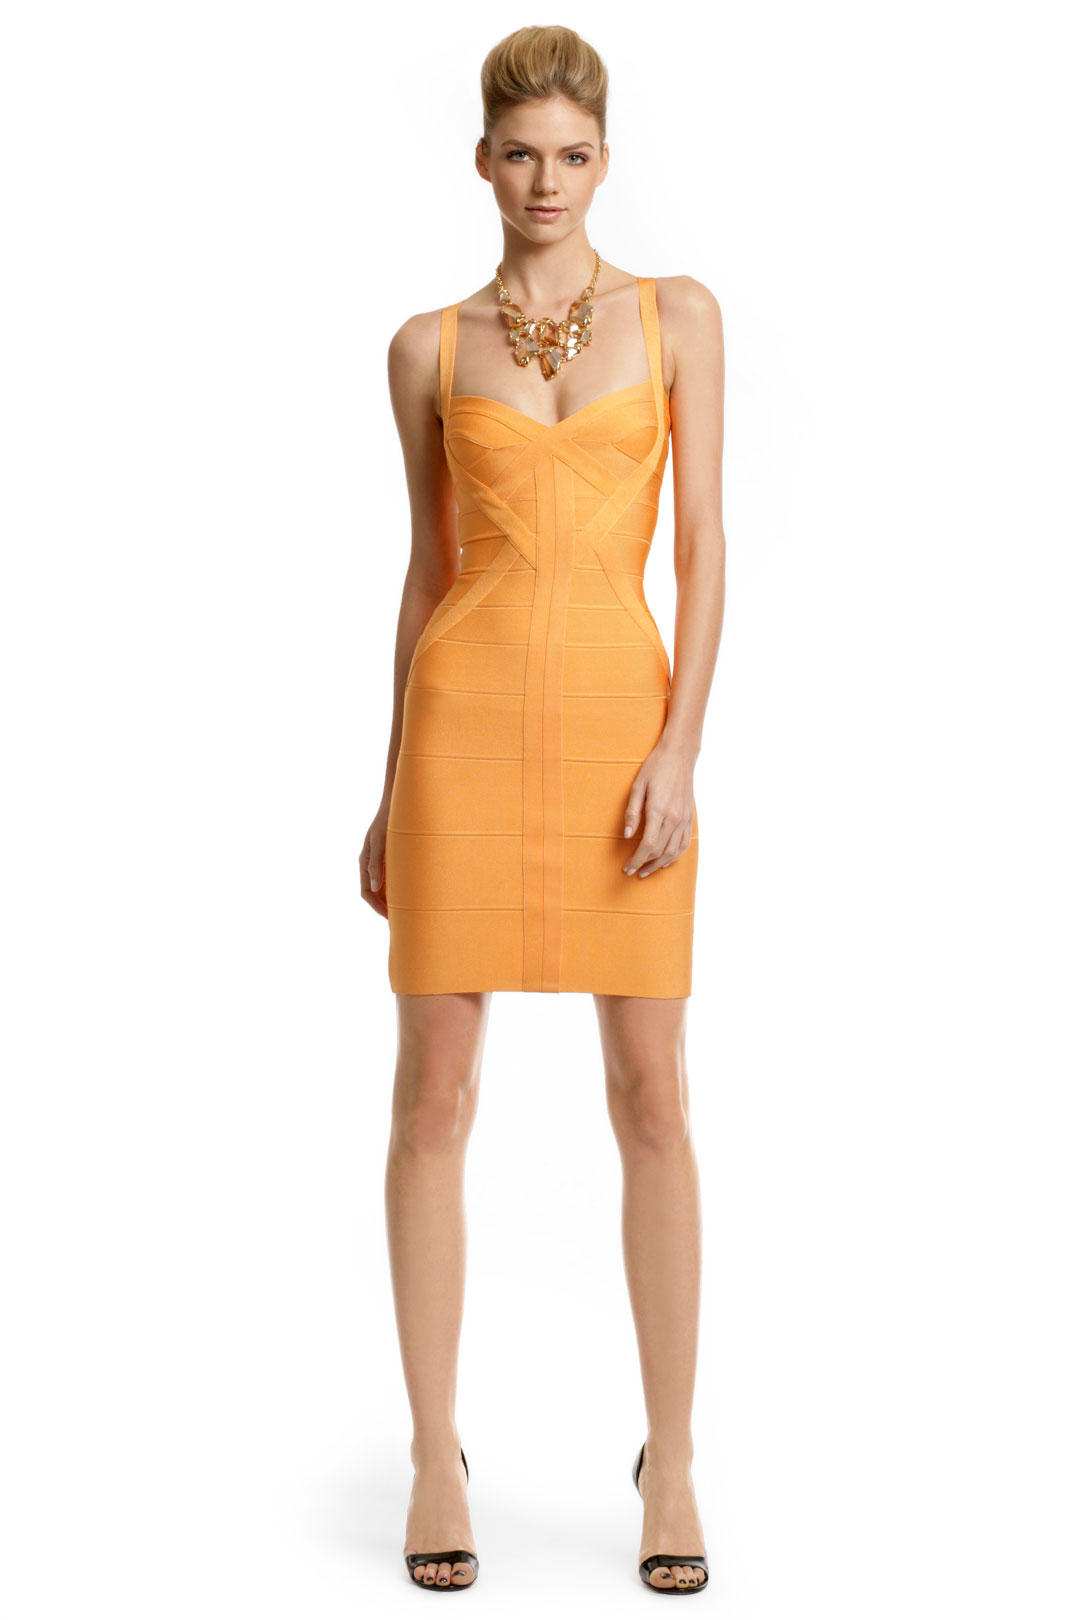 For Sale Light Orange Sweetheart Herve Leger Dress XS